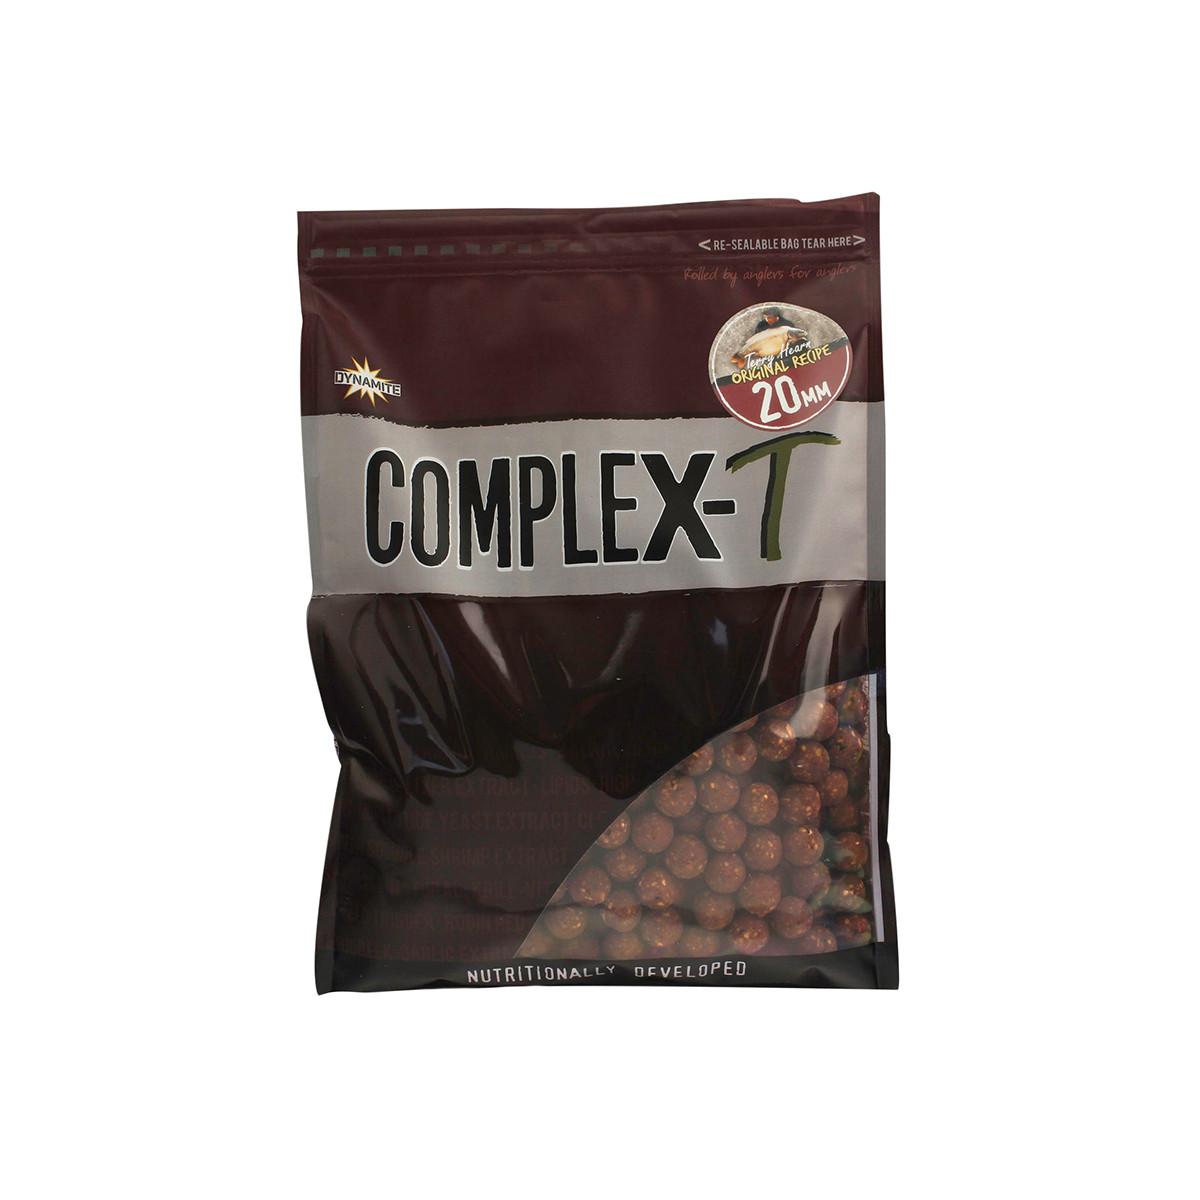 DYNAMTE BAITS TERRY HEARN'S COMPLEX-T BOILIES